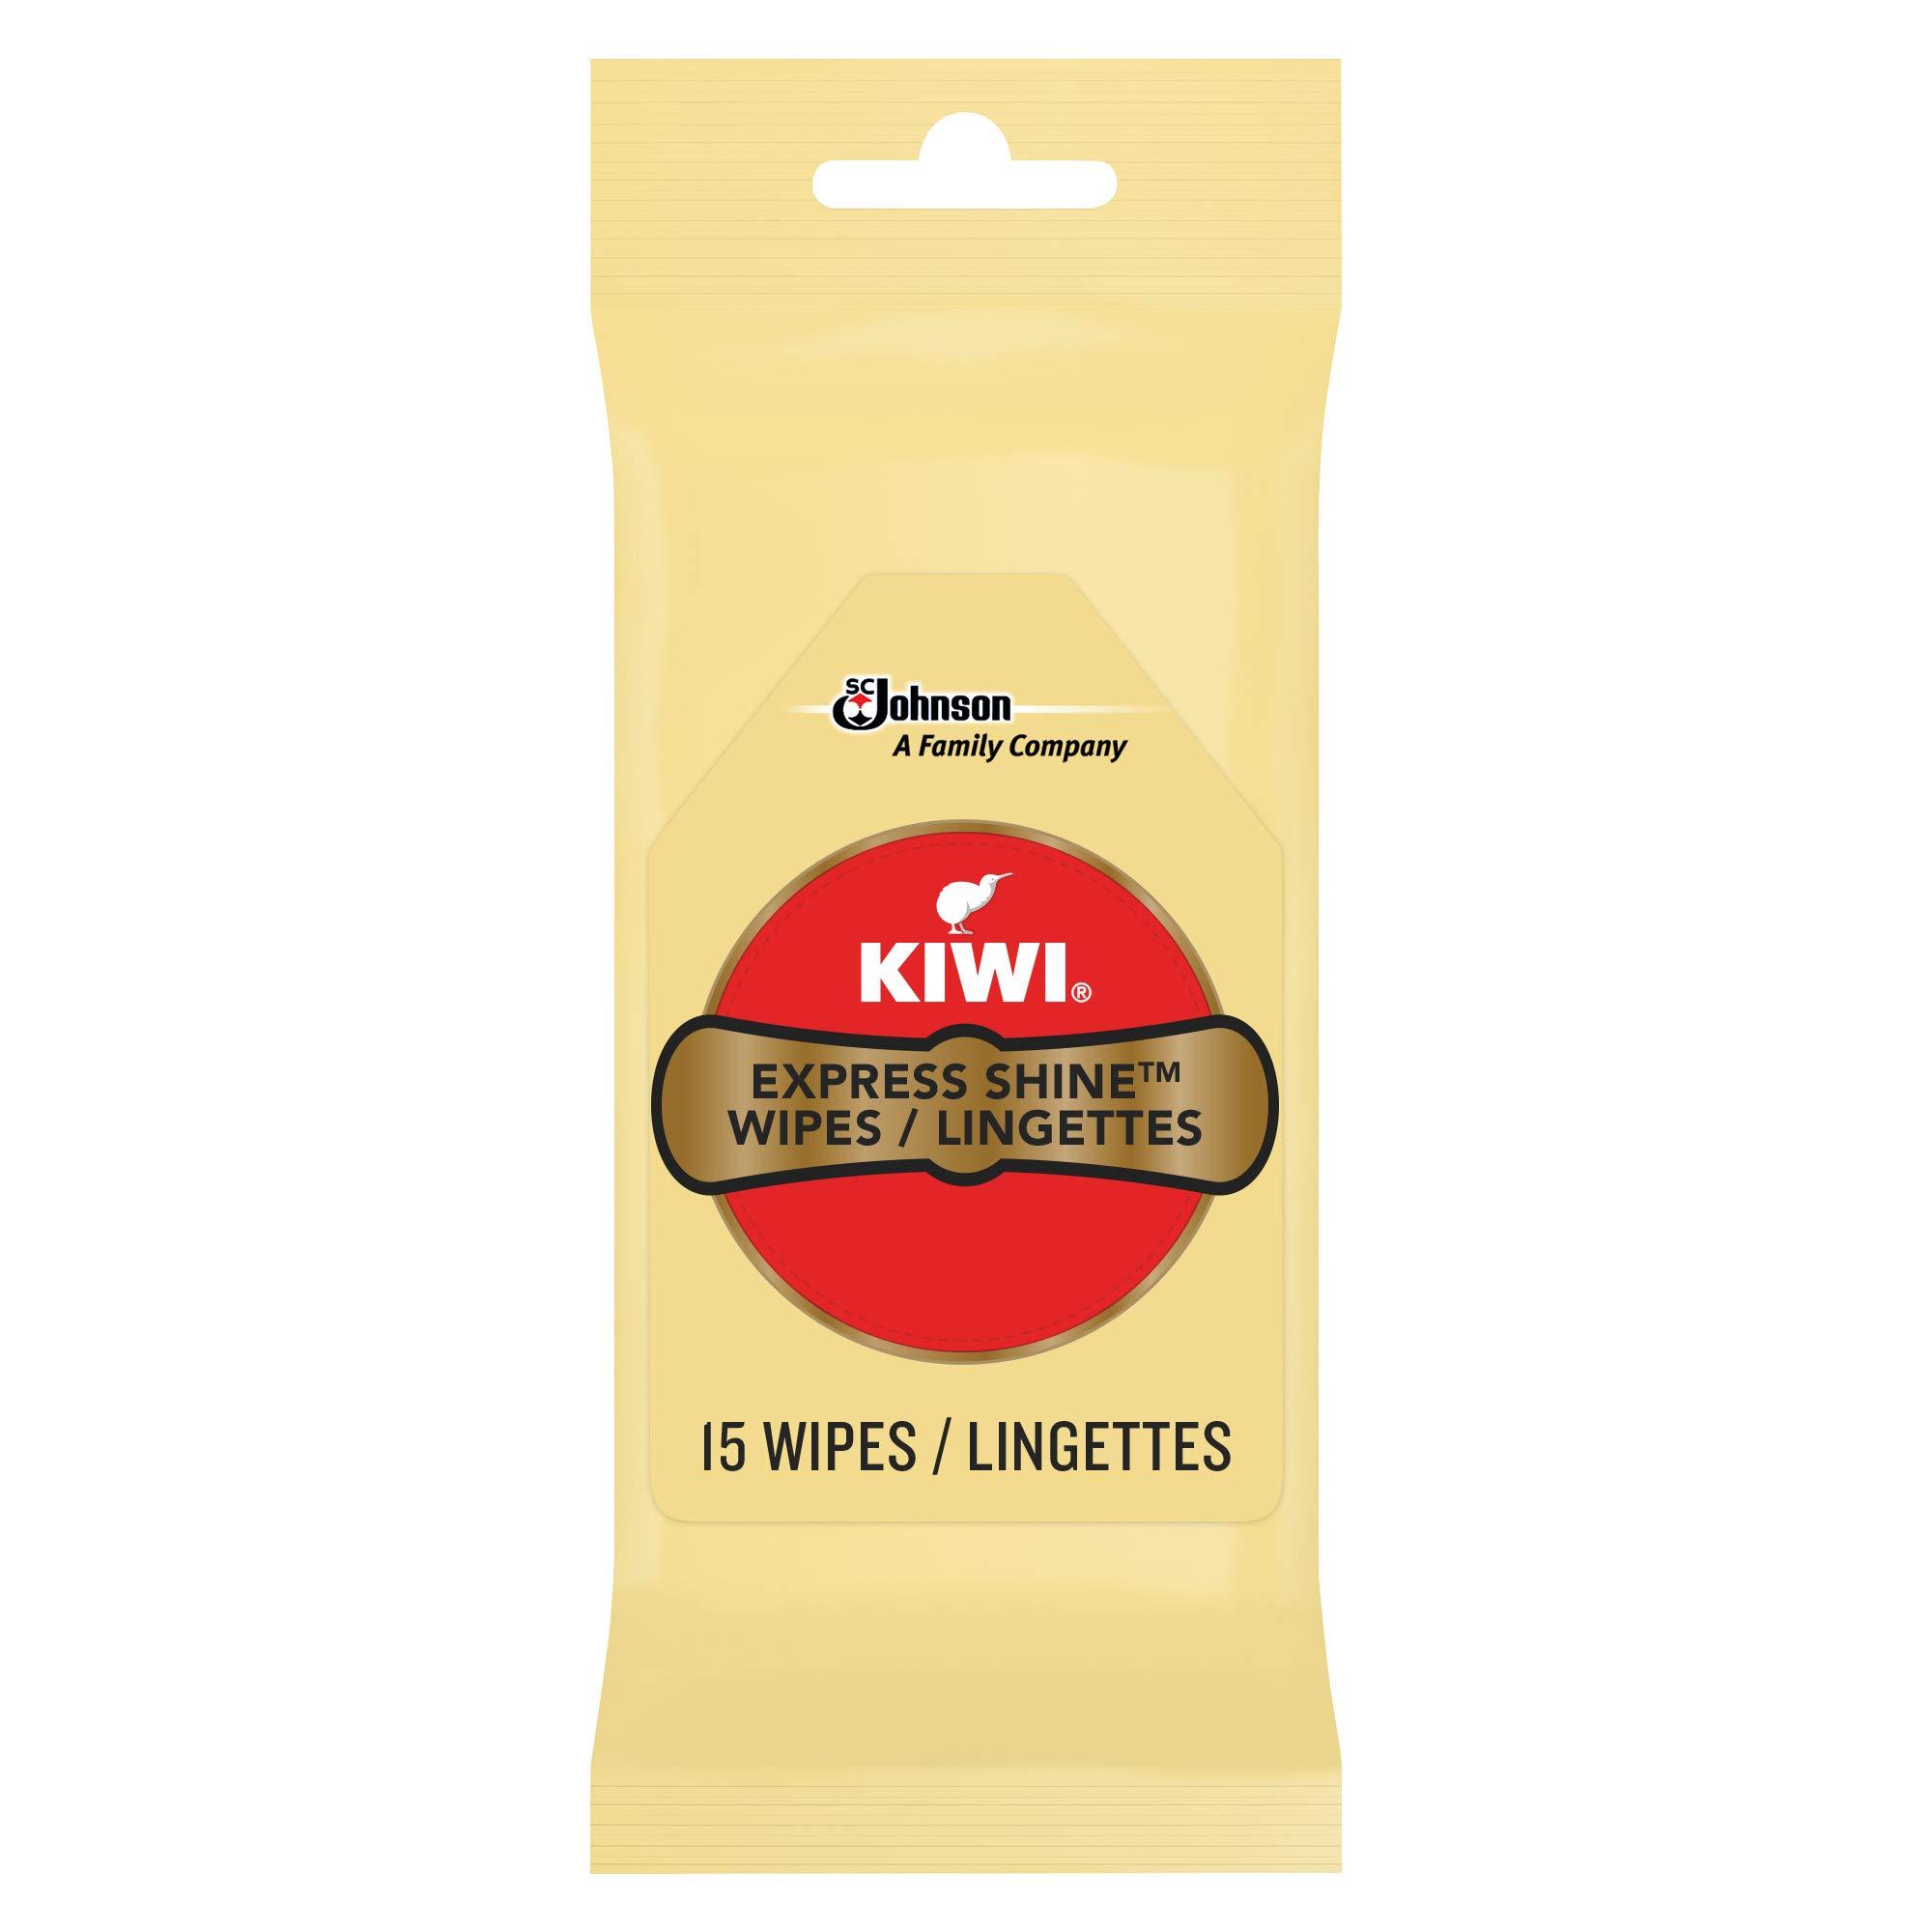 KIWI Express Shine Wipes, 15Ct